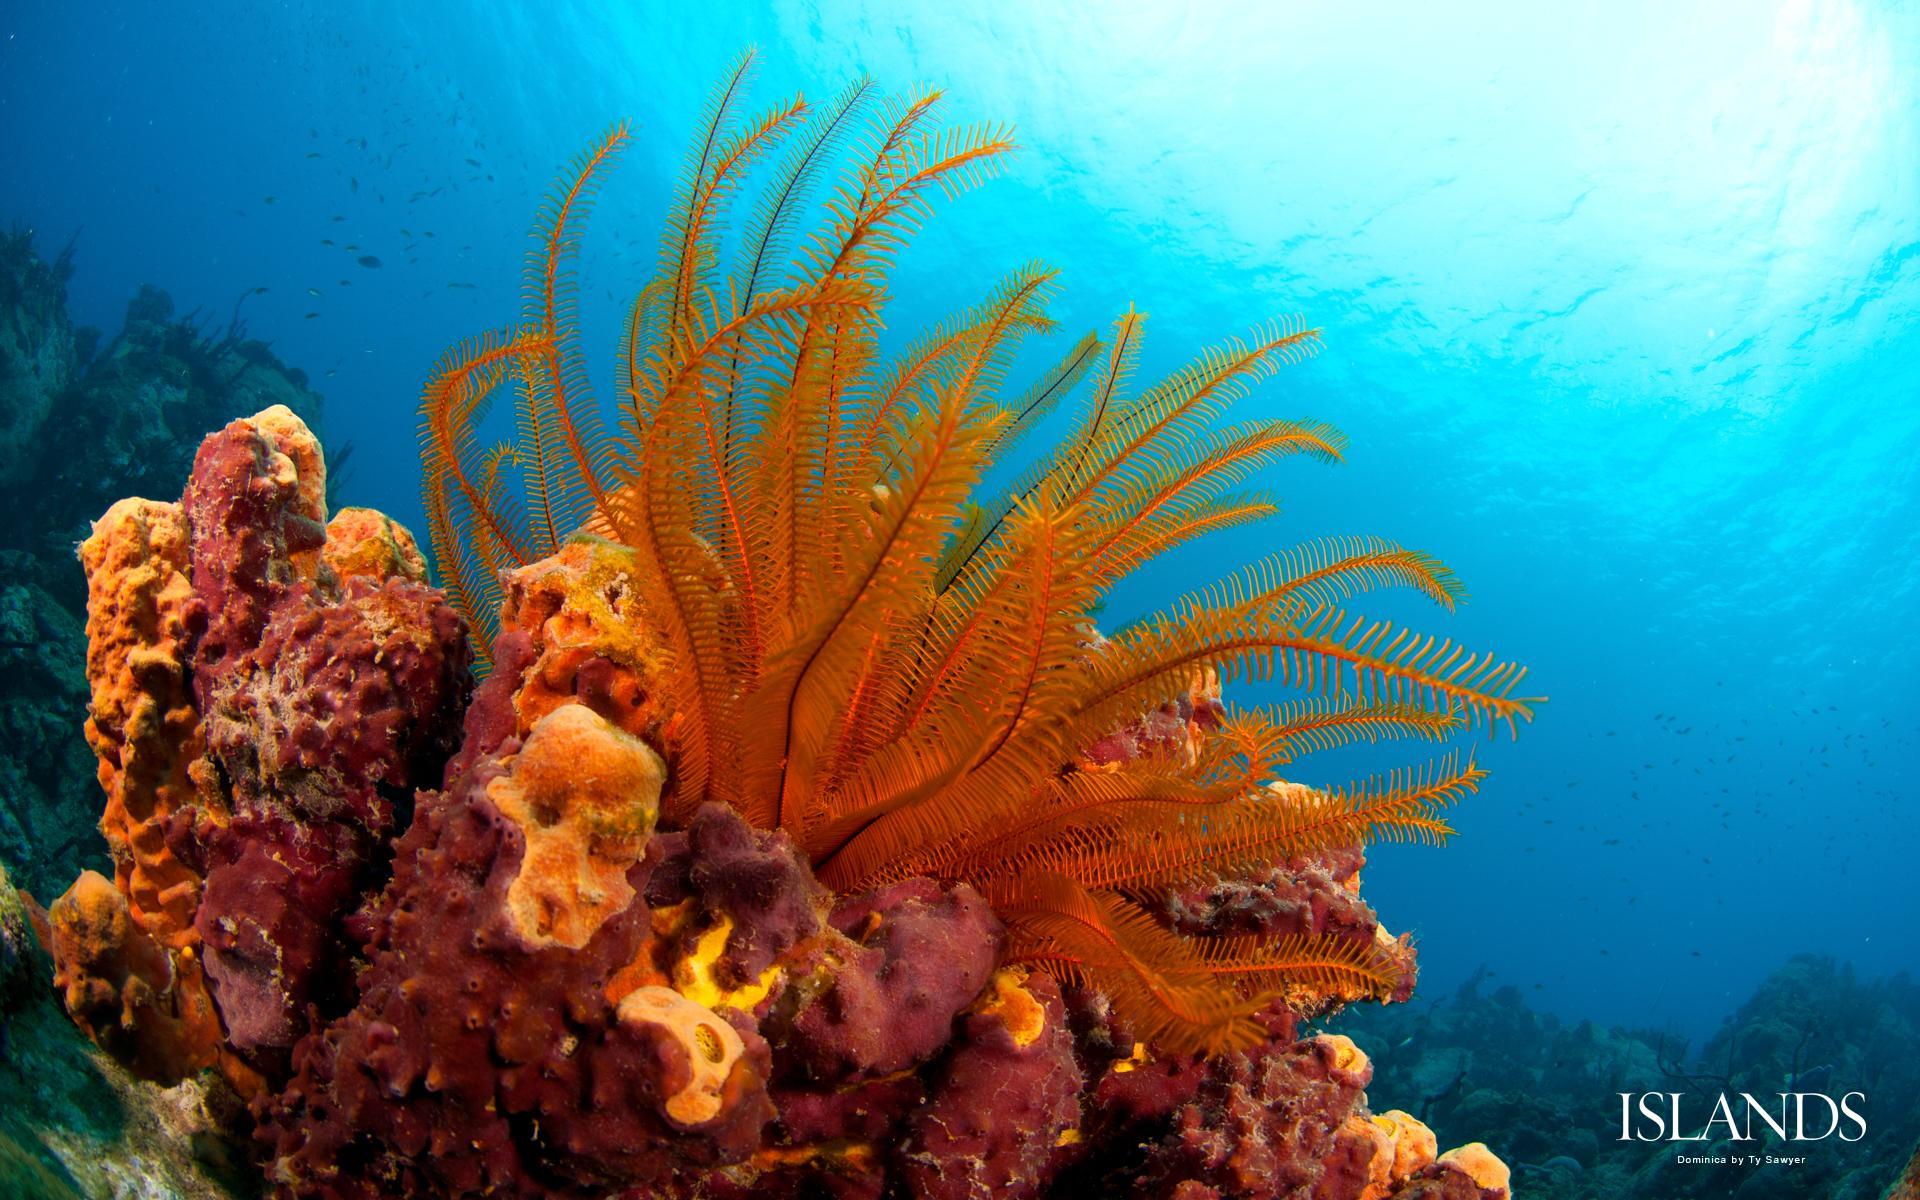 dominica background diving snorkeling caribbean desktop wallpaper 1920x1200